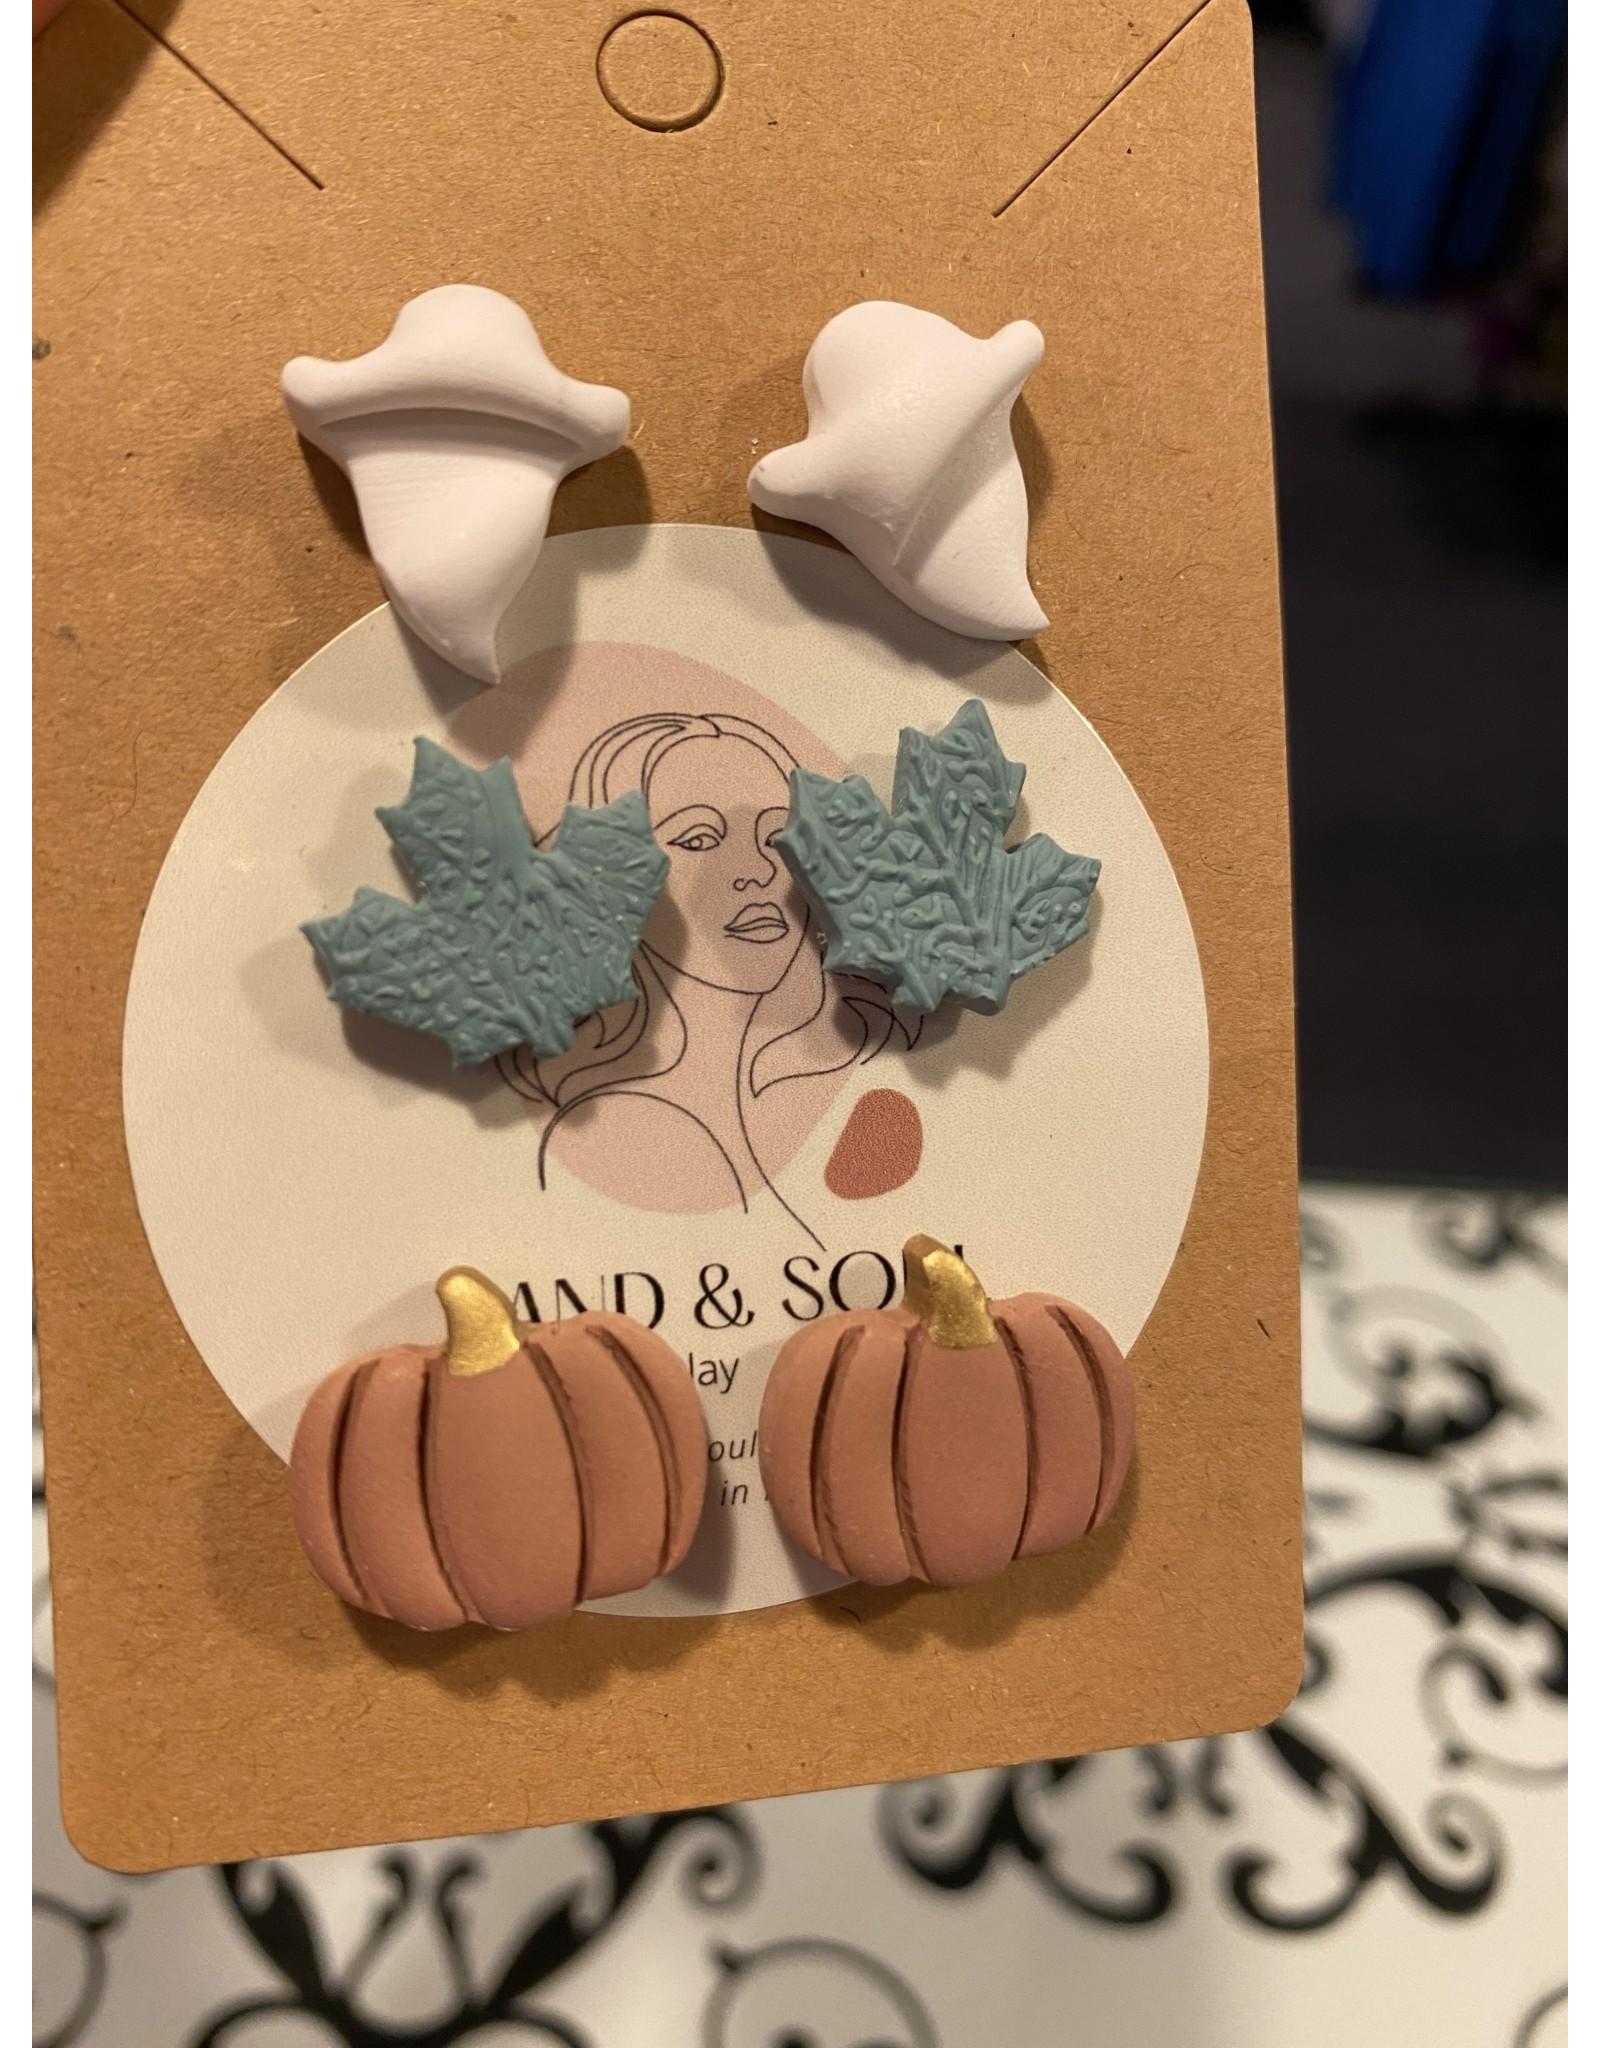 Sand & Soul Fall Stud Clay Earring Set